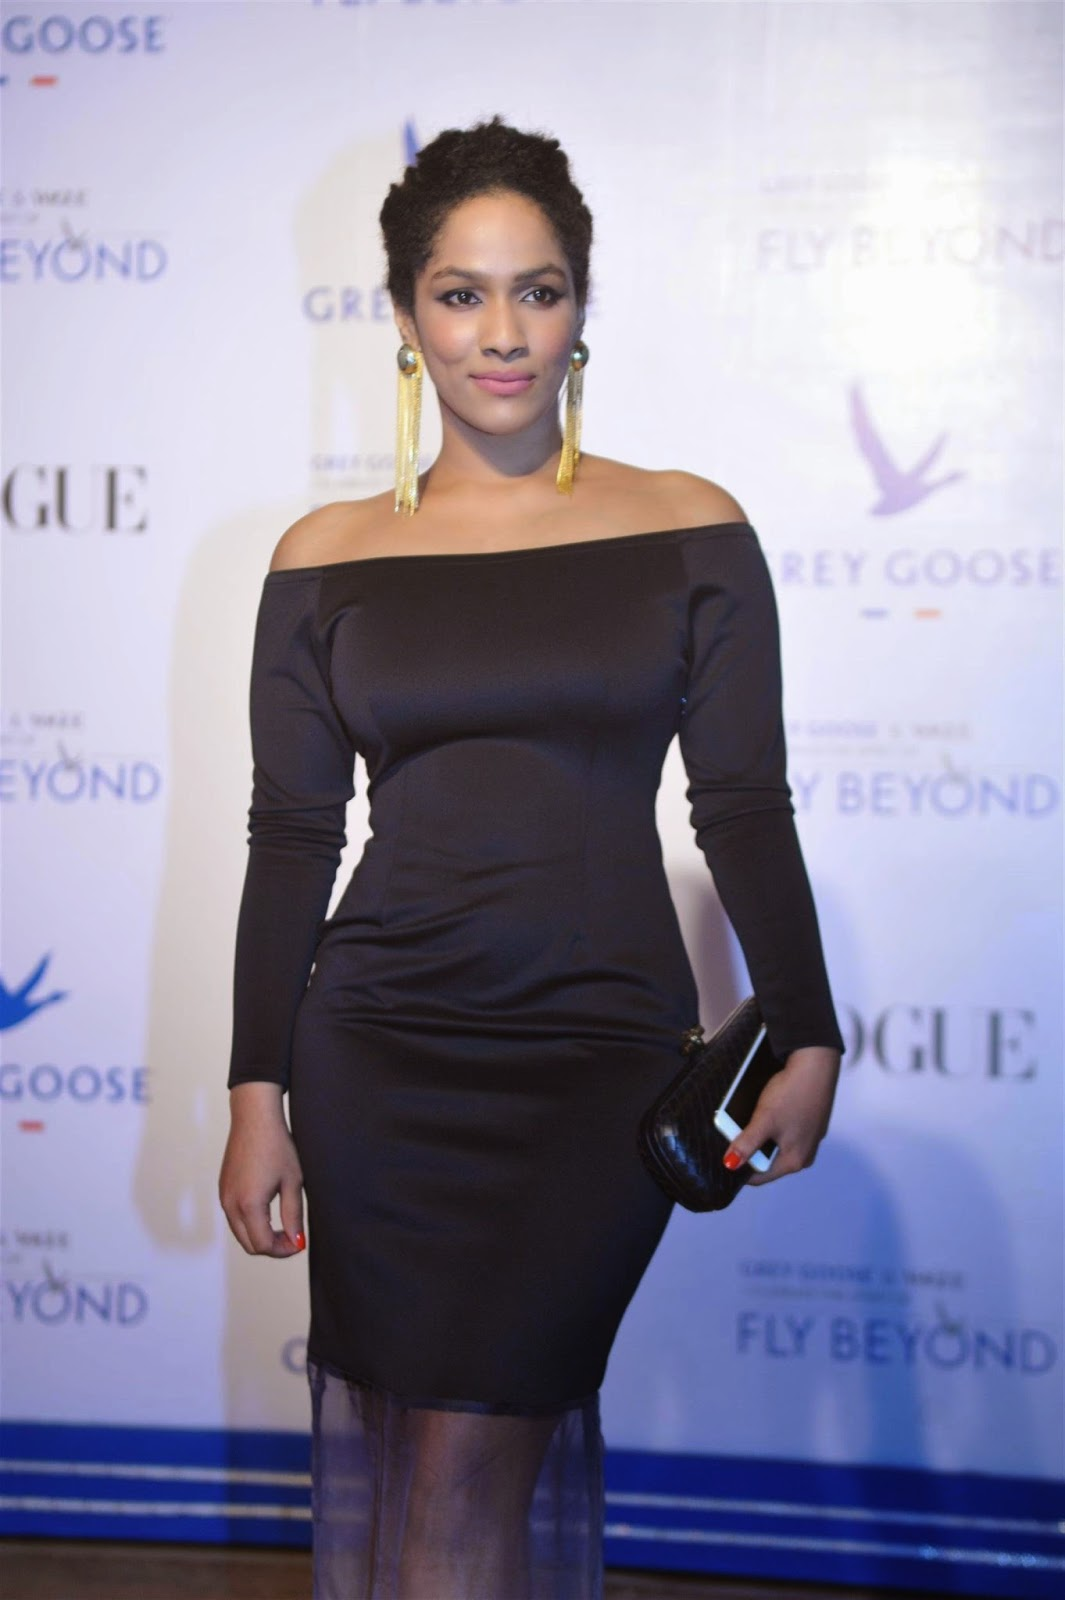 Bollywood Celebs at Grey Goose Fly Beyond Awards 2014 Pics